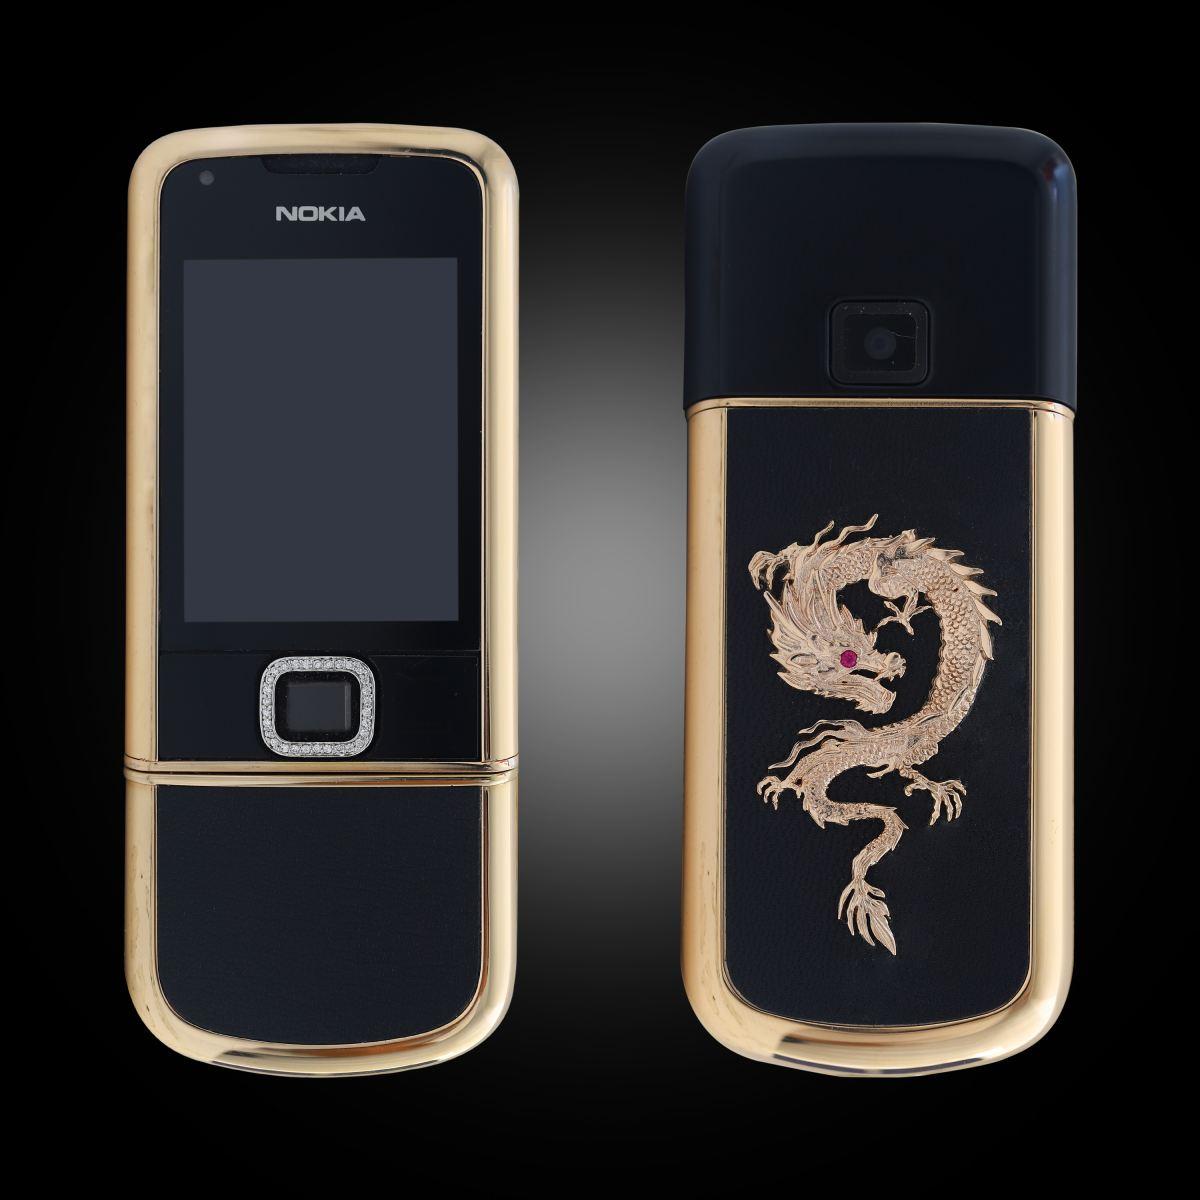 Nokia 8800 Rose Gold Đen đính rồng